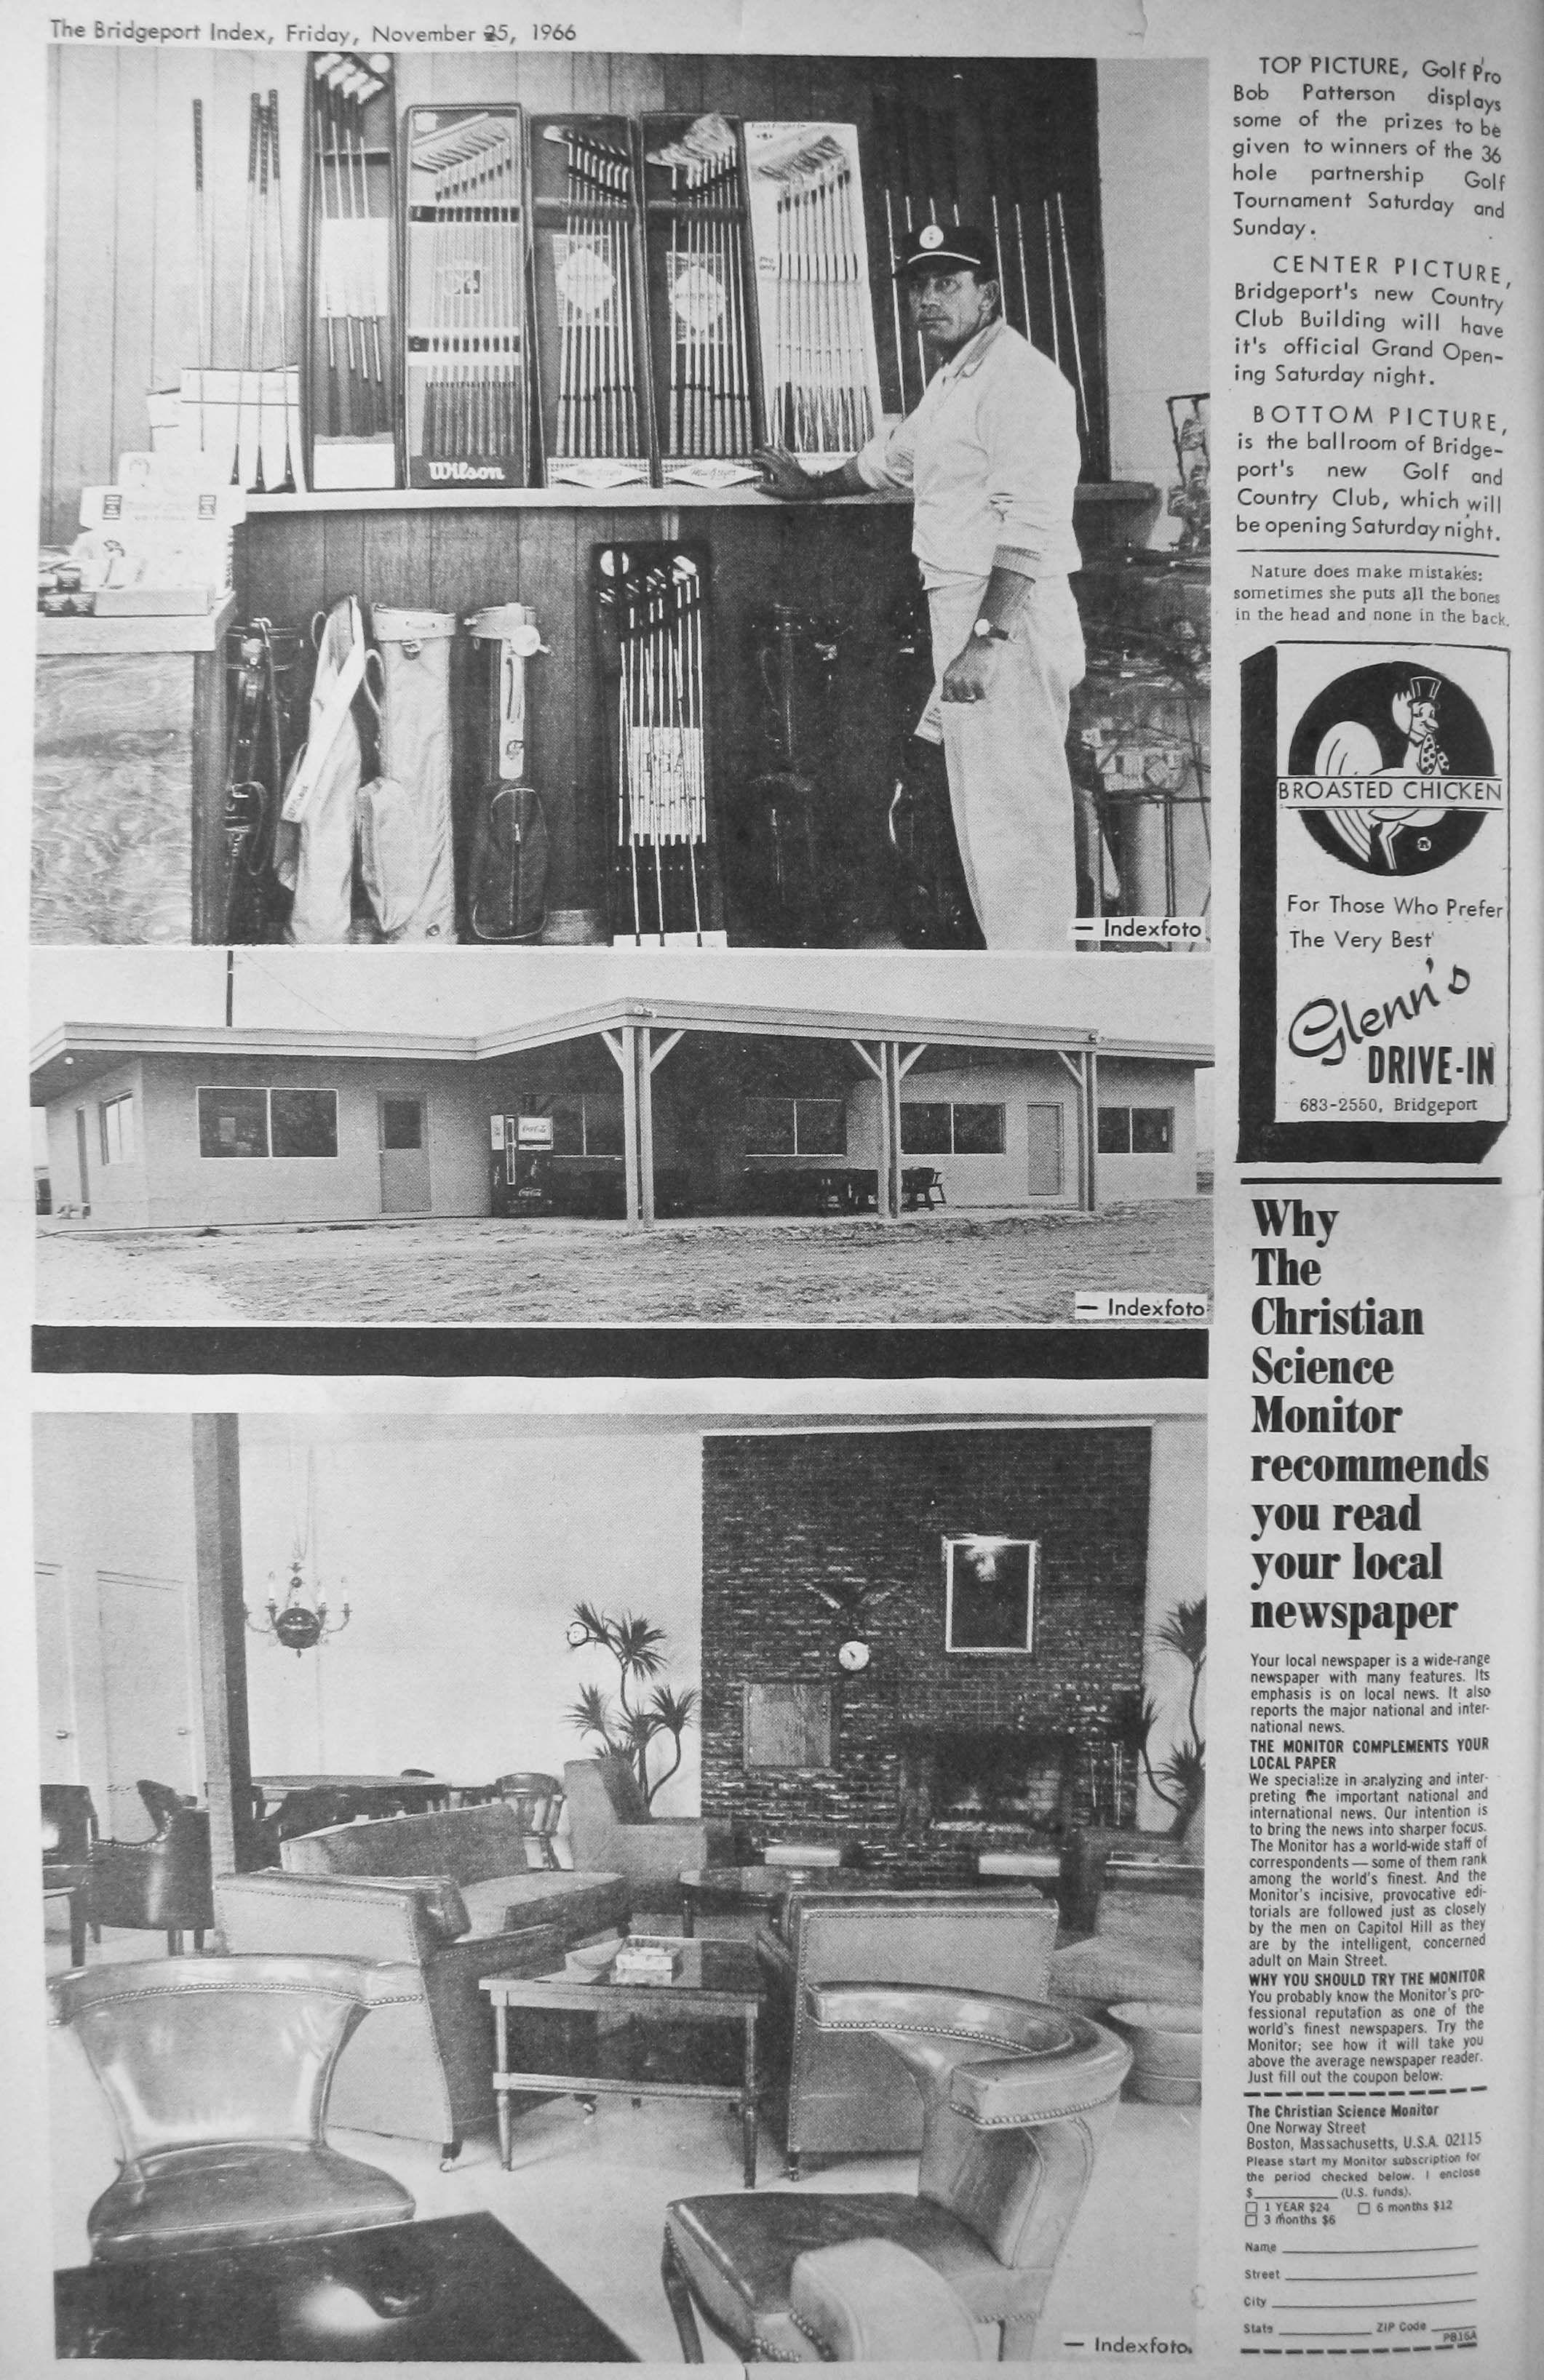 http://www.wisecountytexas.info/bridgeportindex/images/1966/1966-11-25-pg04.jpg